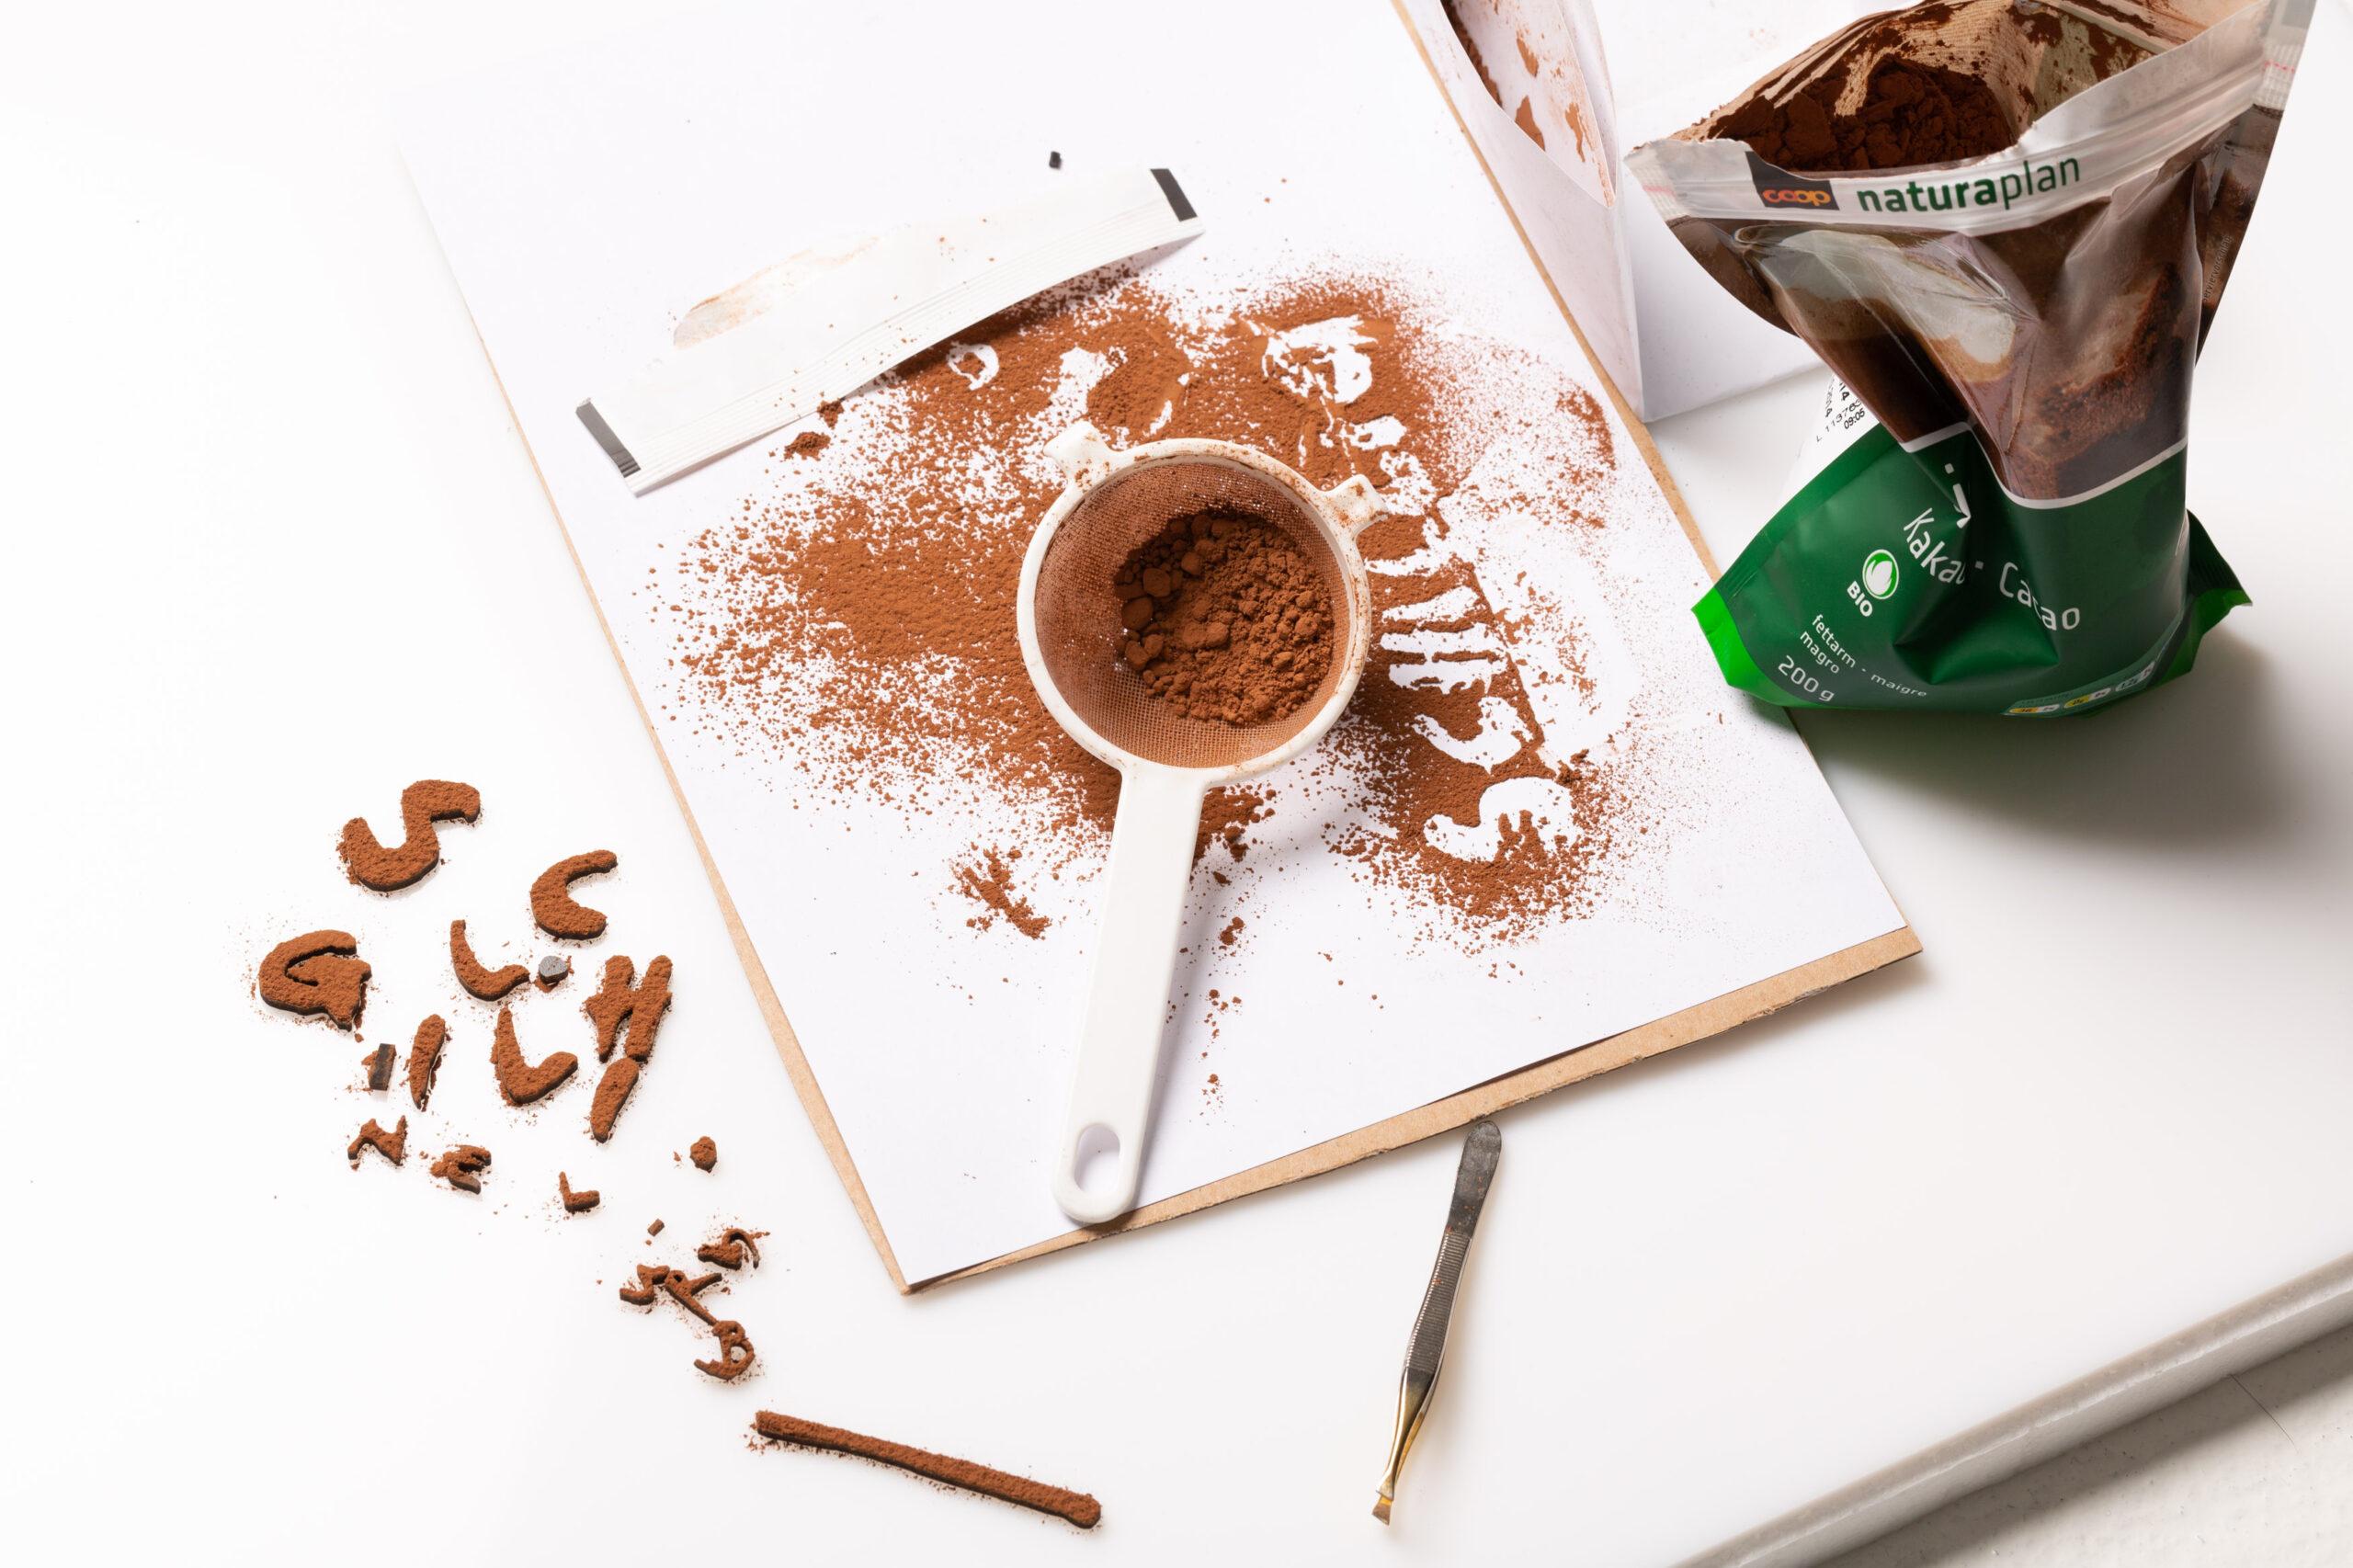 Making-Of Foodfotografie